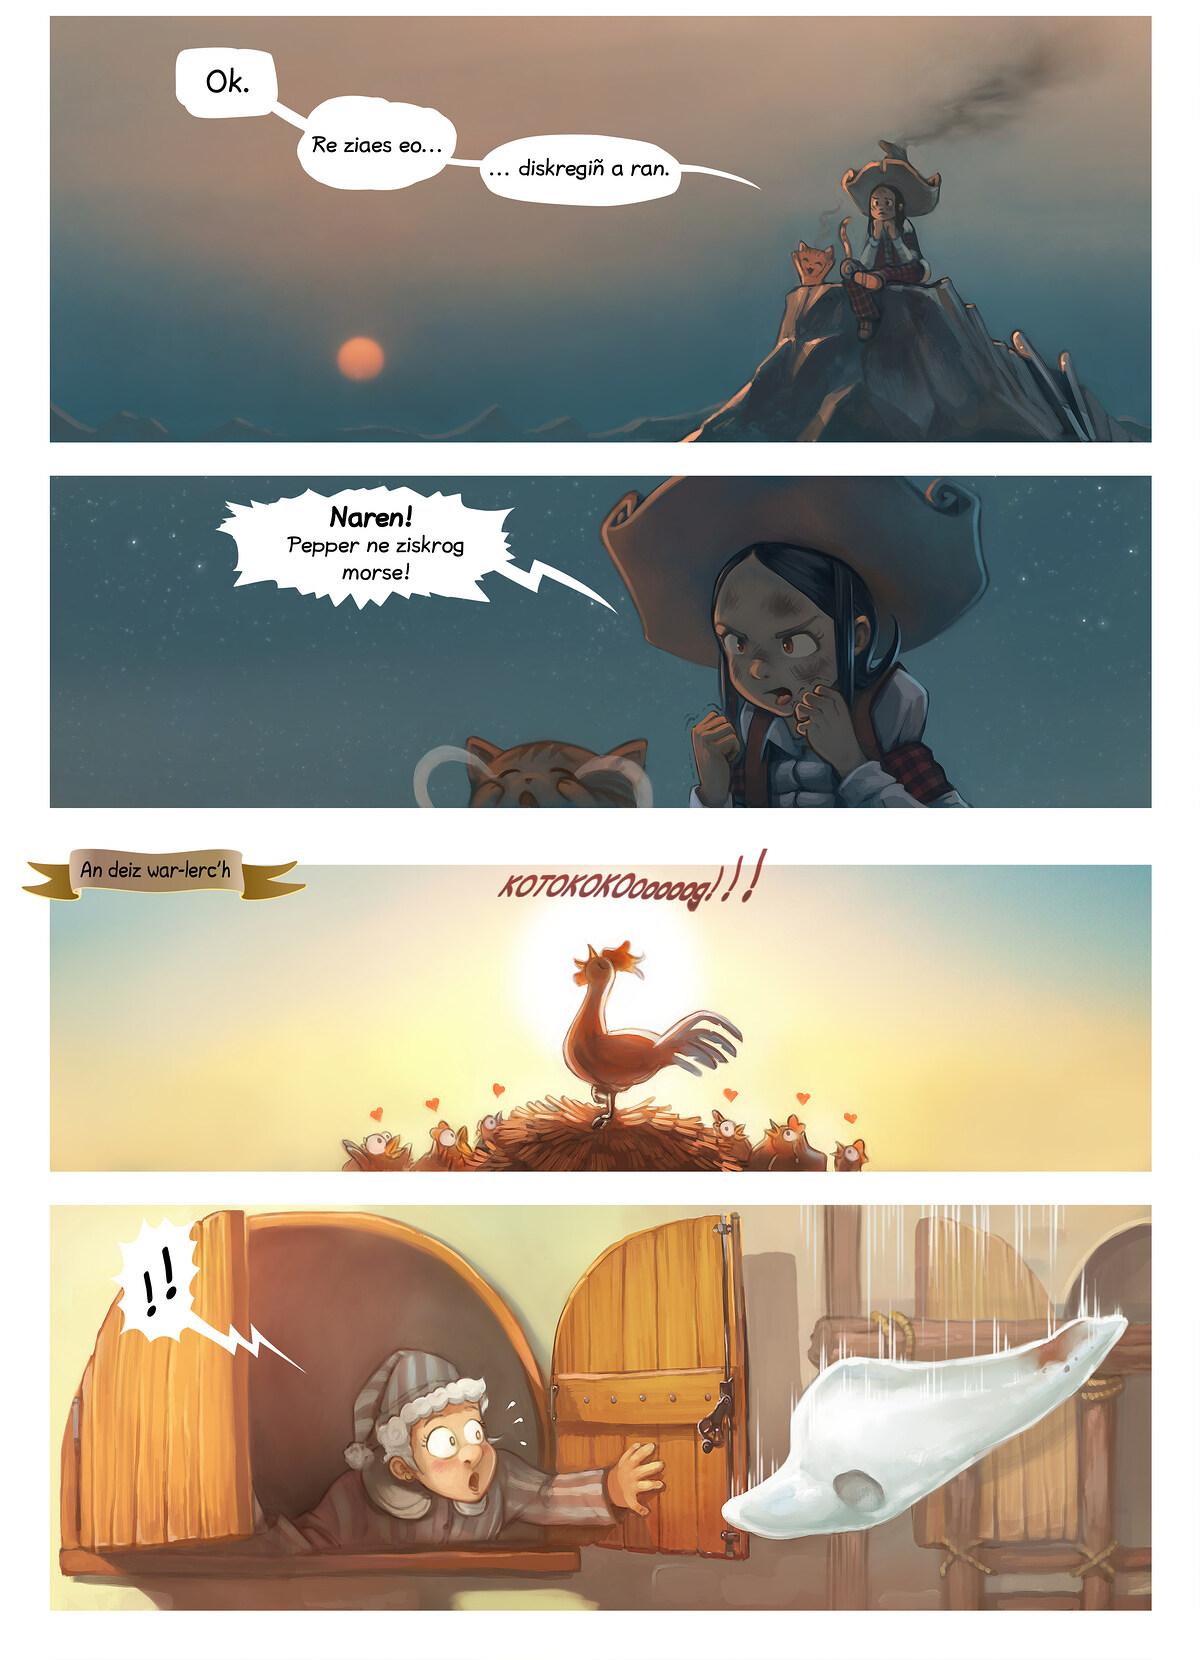 A webcomic page of Pepper&Carrot, rann 14 [br], pajenn 5